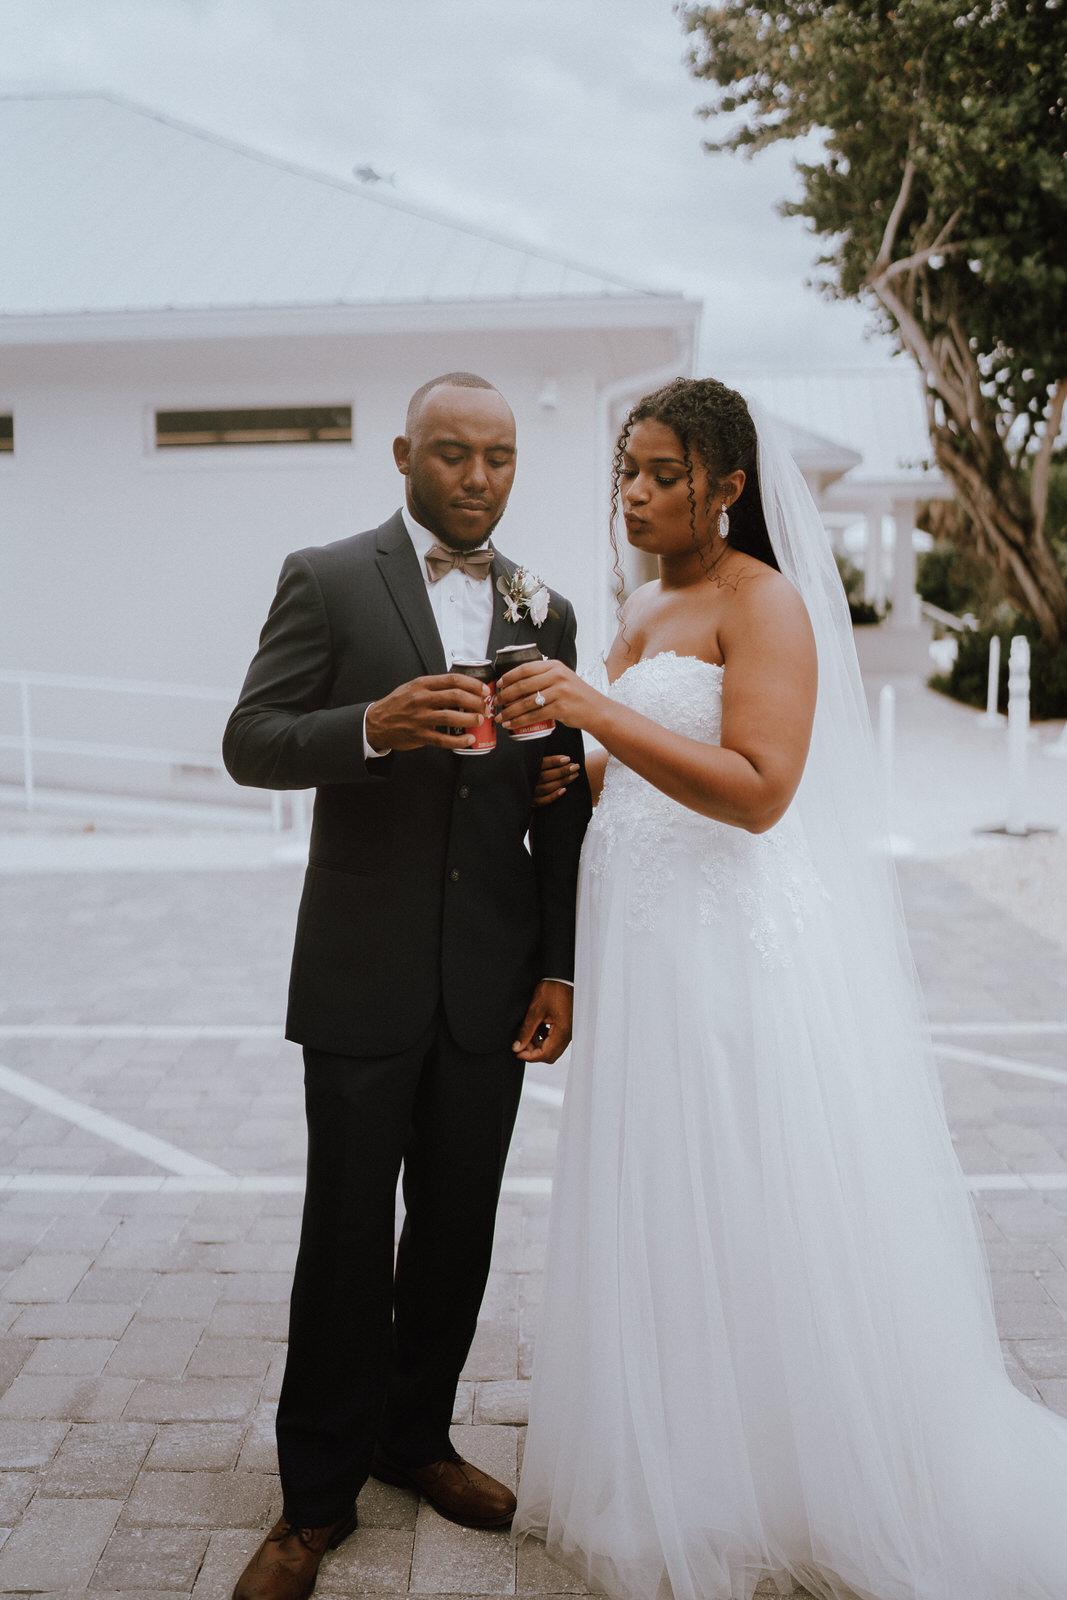 South Seas Island Resort Elopement- Alyana and Shawn- Michelle Gonzalez Photography-275.JPG